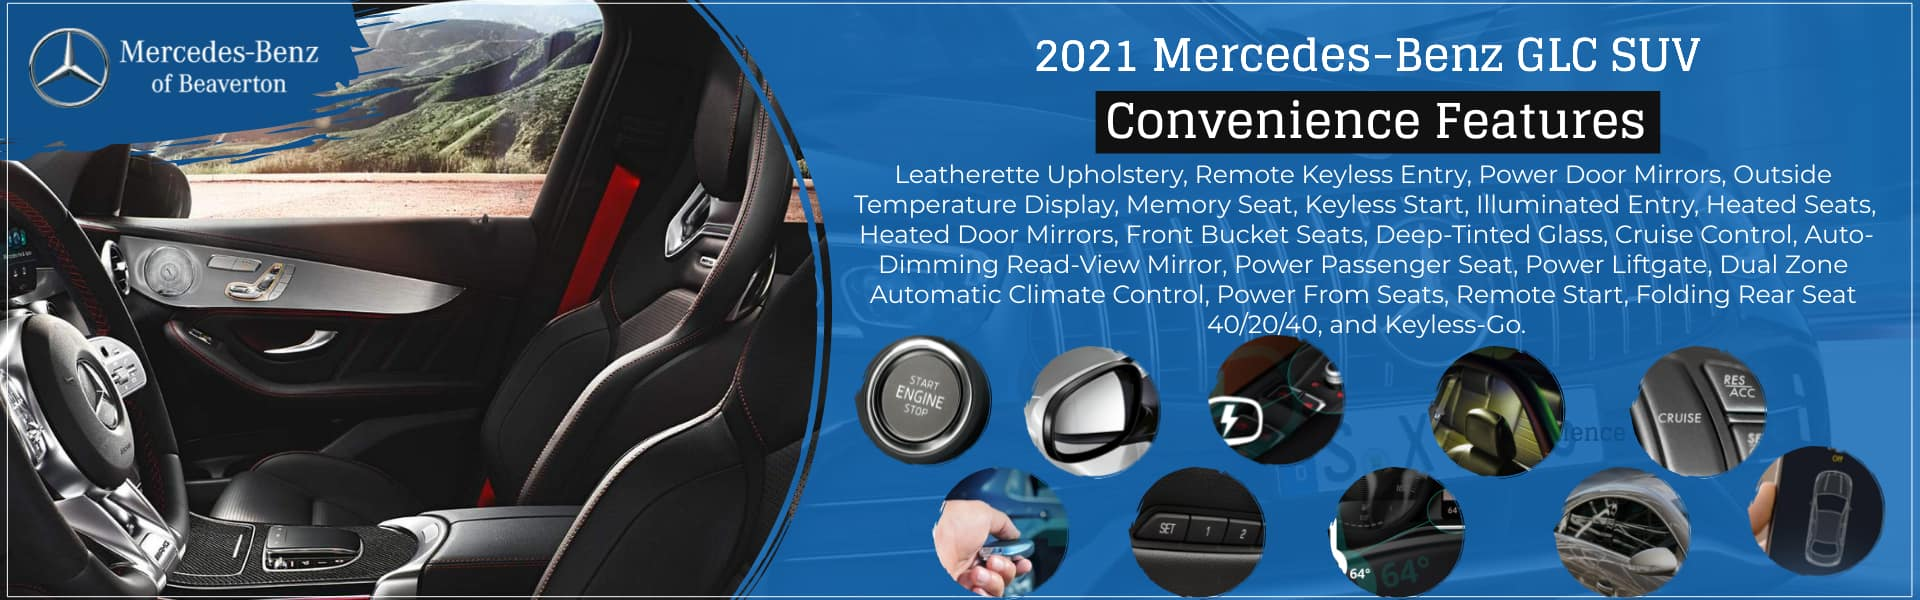 2021 Mercedes-Benz GLC SUV of Beaverton Convenience Features